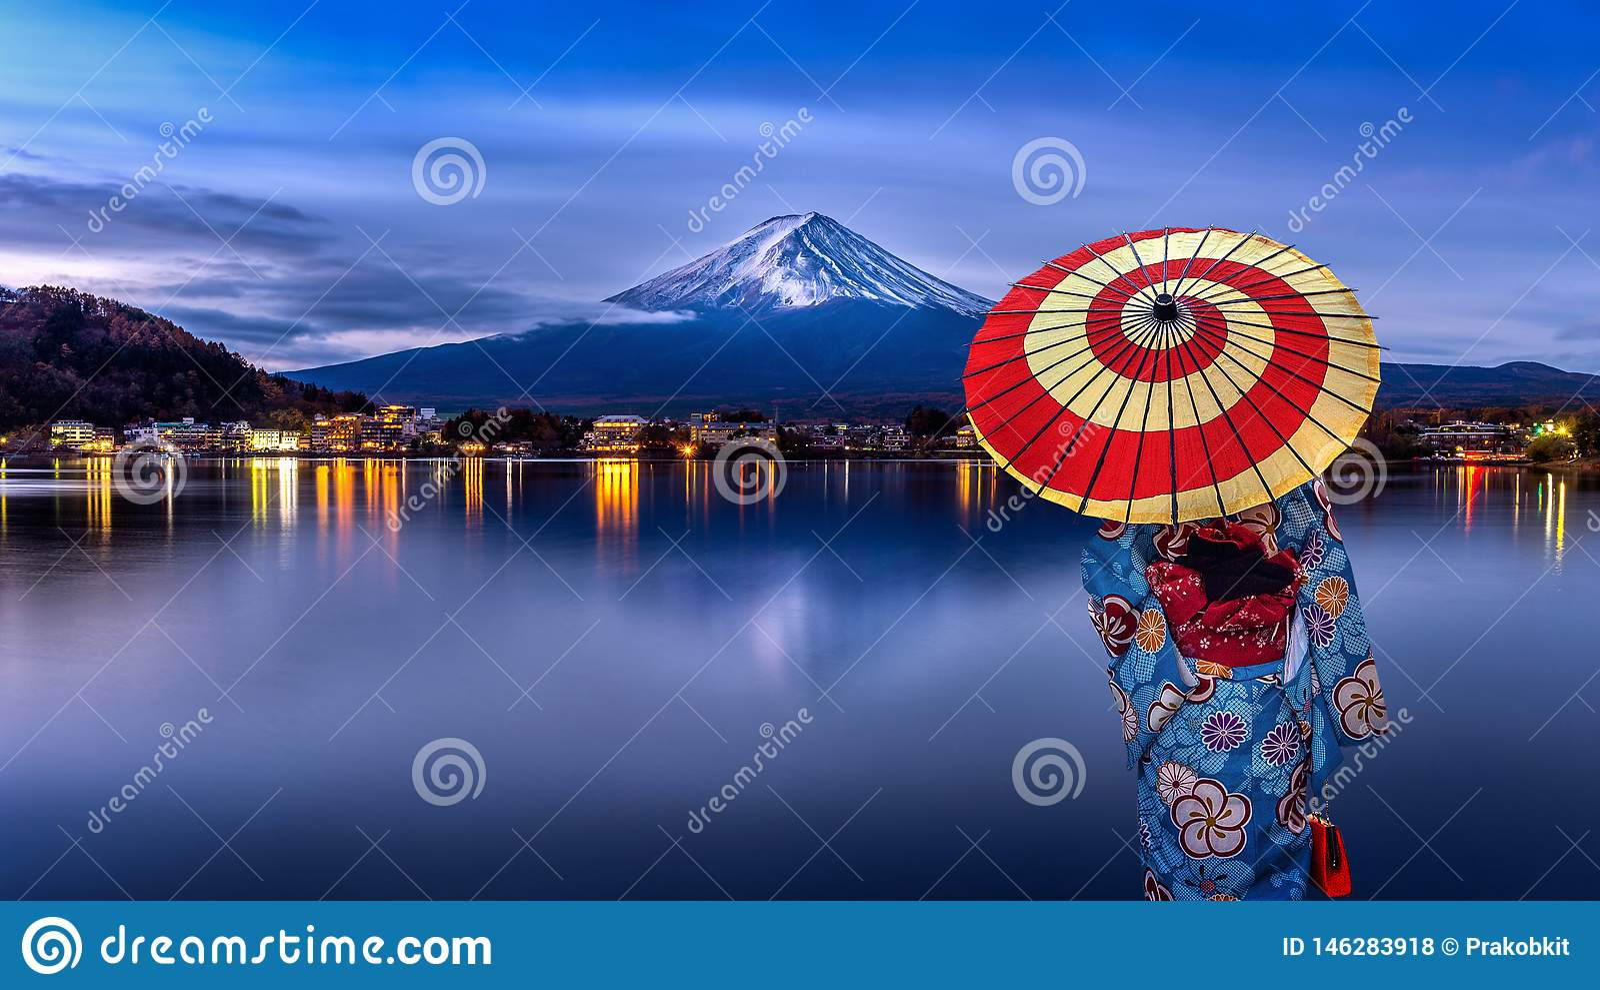 Mujer asi?tica que lleva el kimono tradicional japon?s en la monta?a de Fuji, lago Kawaguchiko en Jap?n